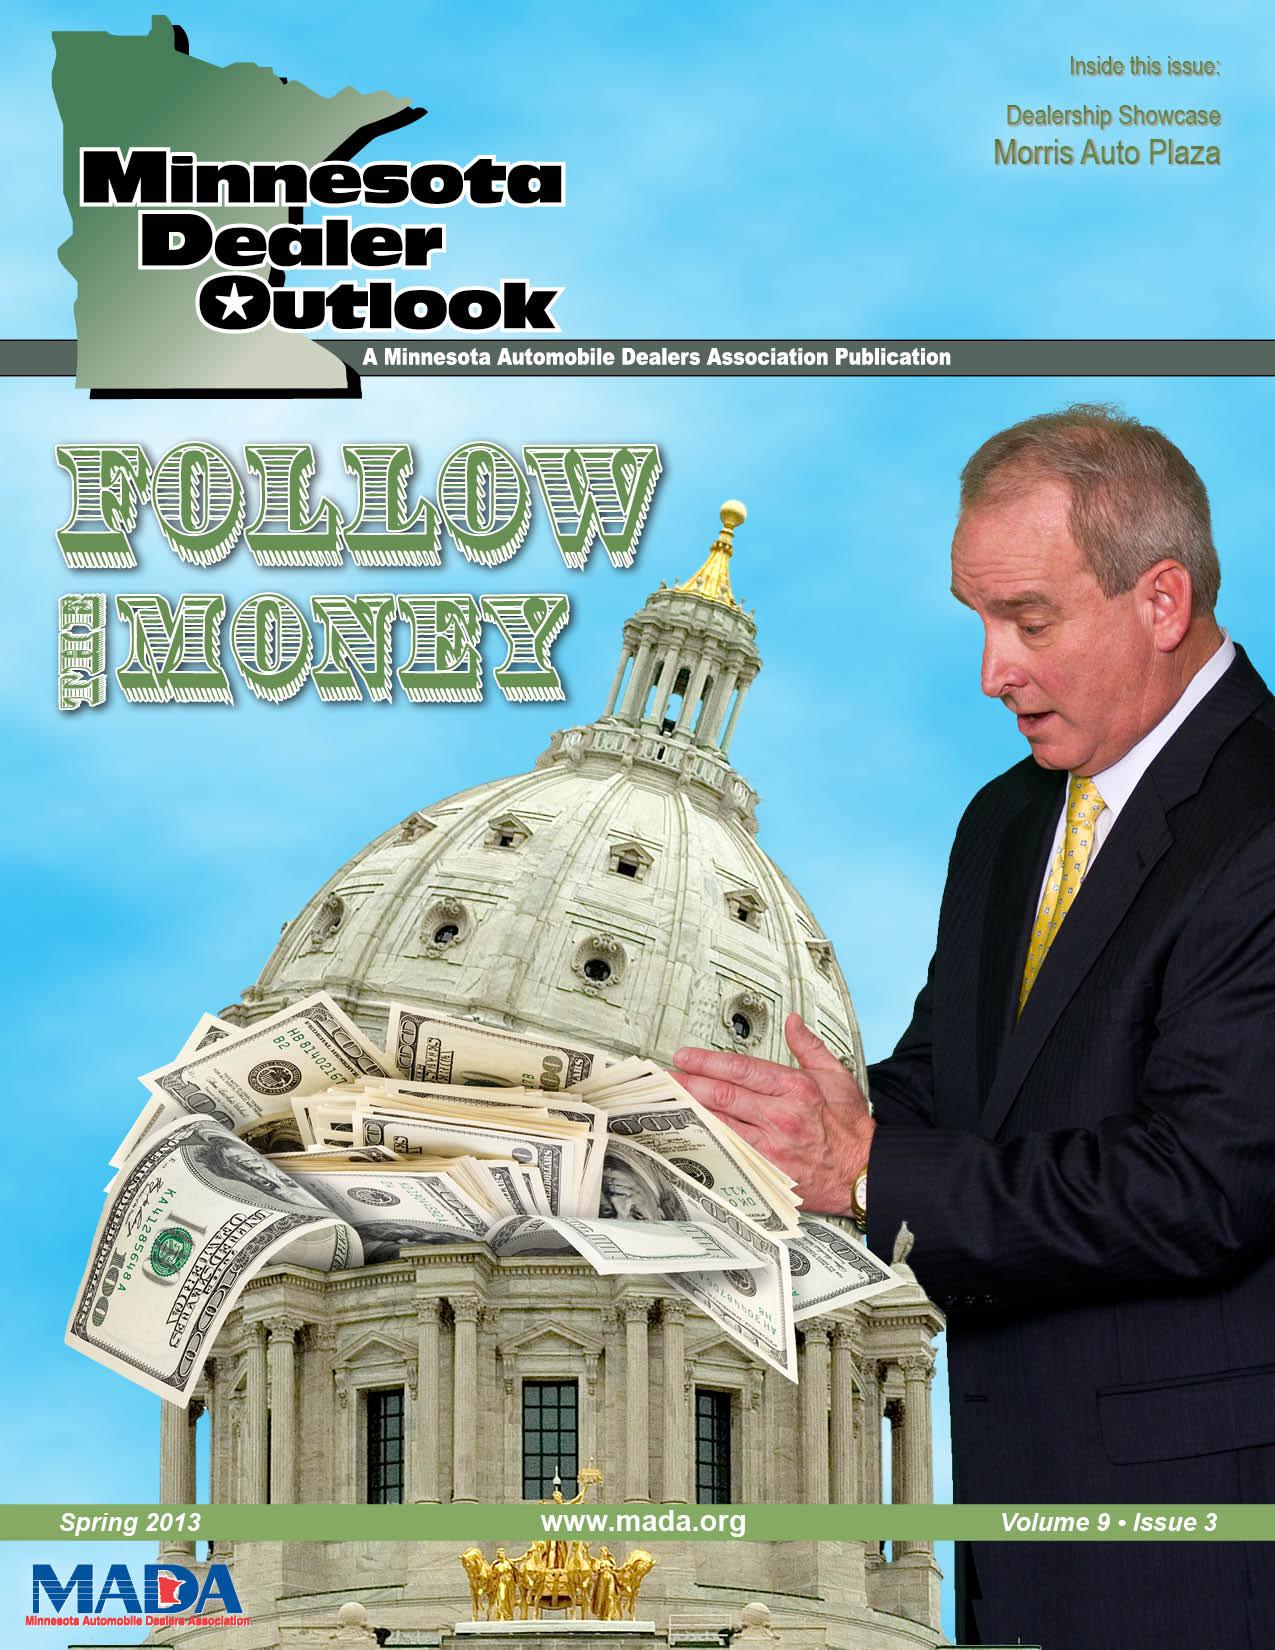 Minnesota Dealer Outlook Spring 2013